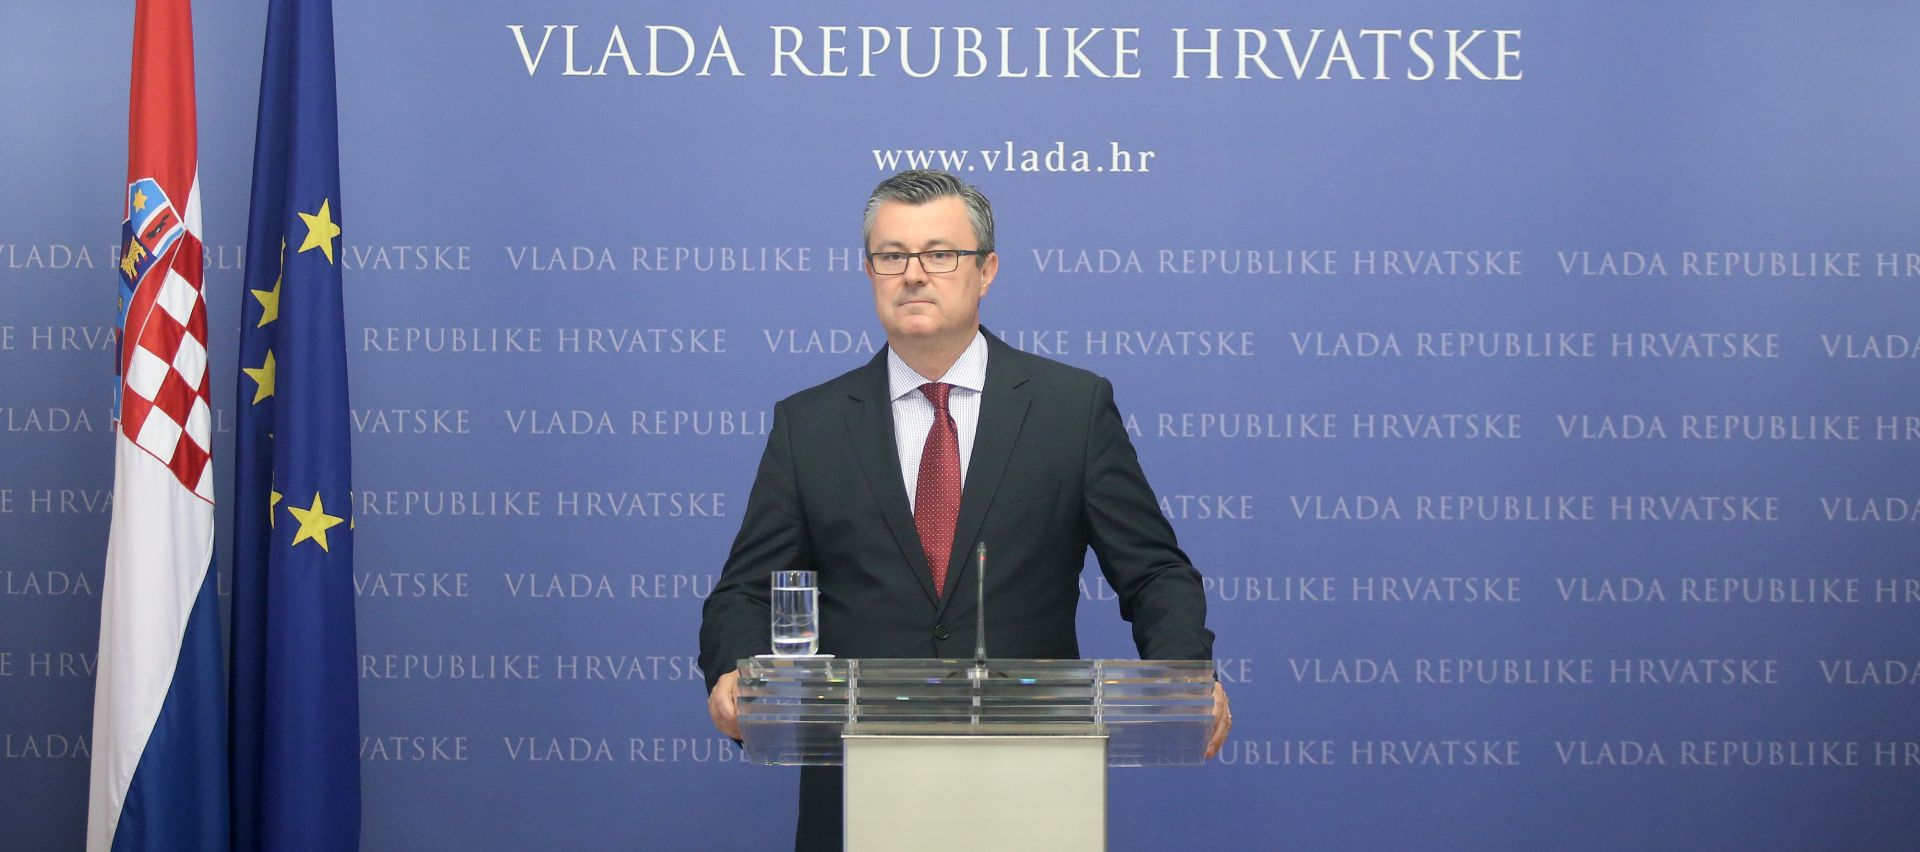 "OREŠKOVIĆ IZRAZIO SUĆUT HOLLANDEU ""Hrvatska je uz Francusku u borbi protiv terorizma"""